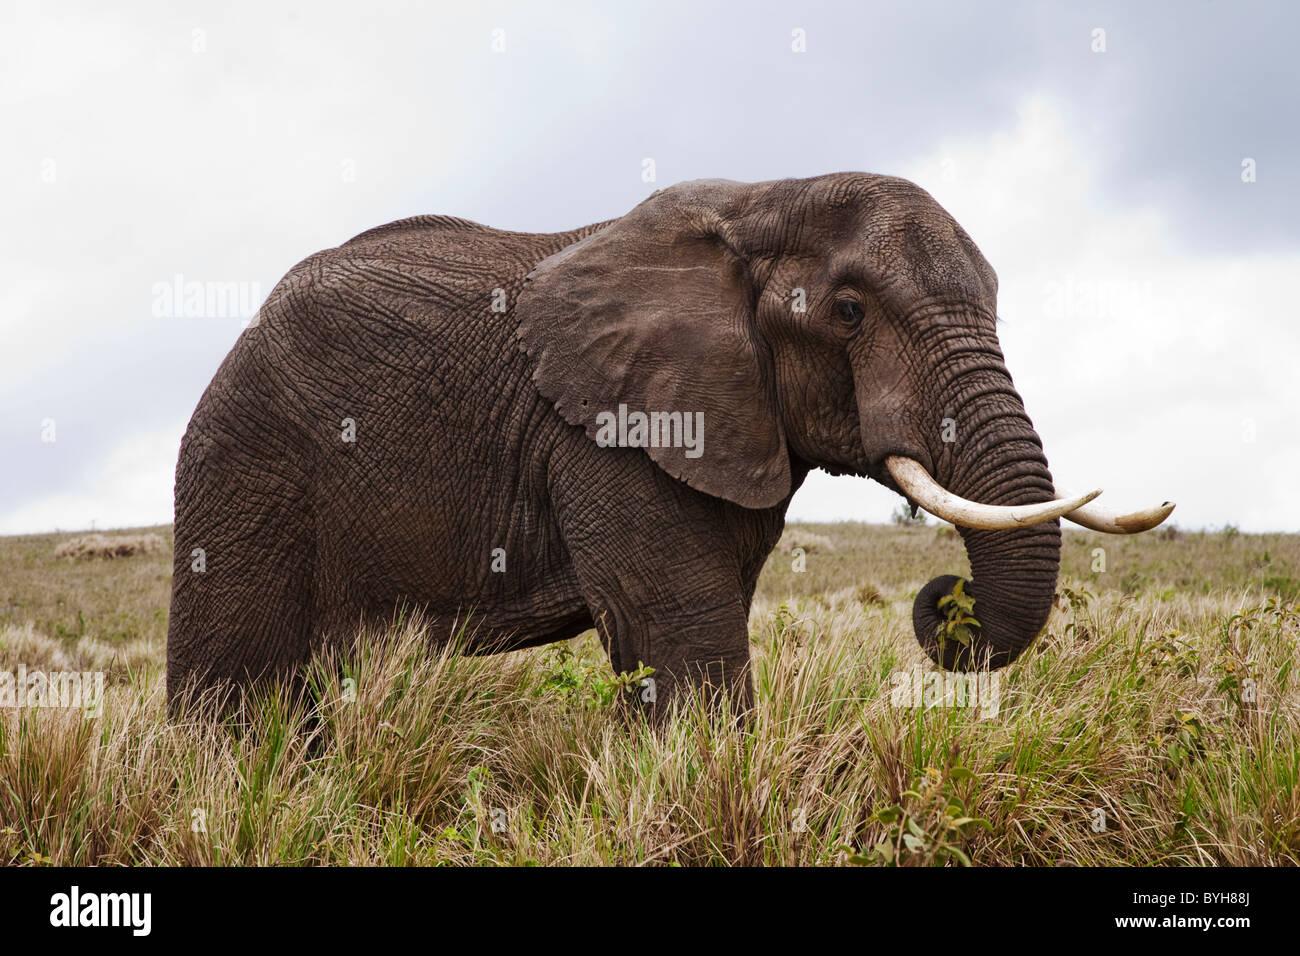 Elephant in Serengeti National Park, Tanzania, Africa - Stock Image